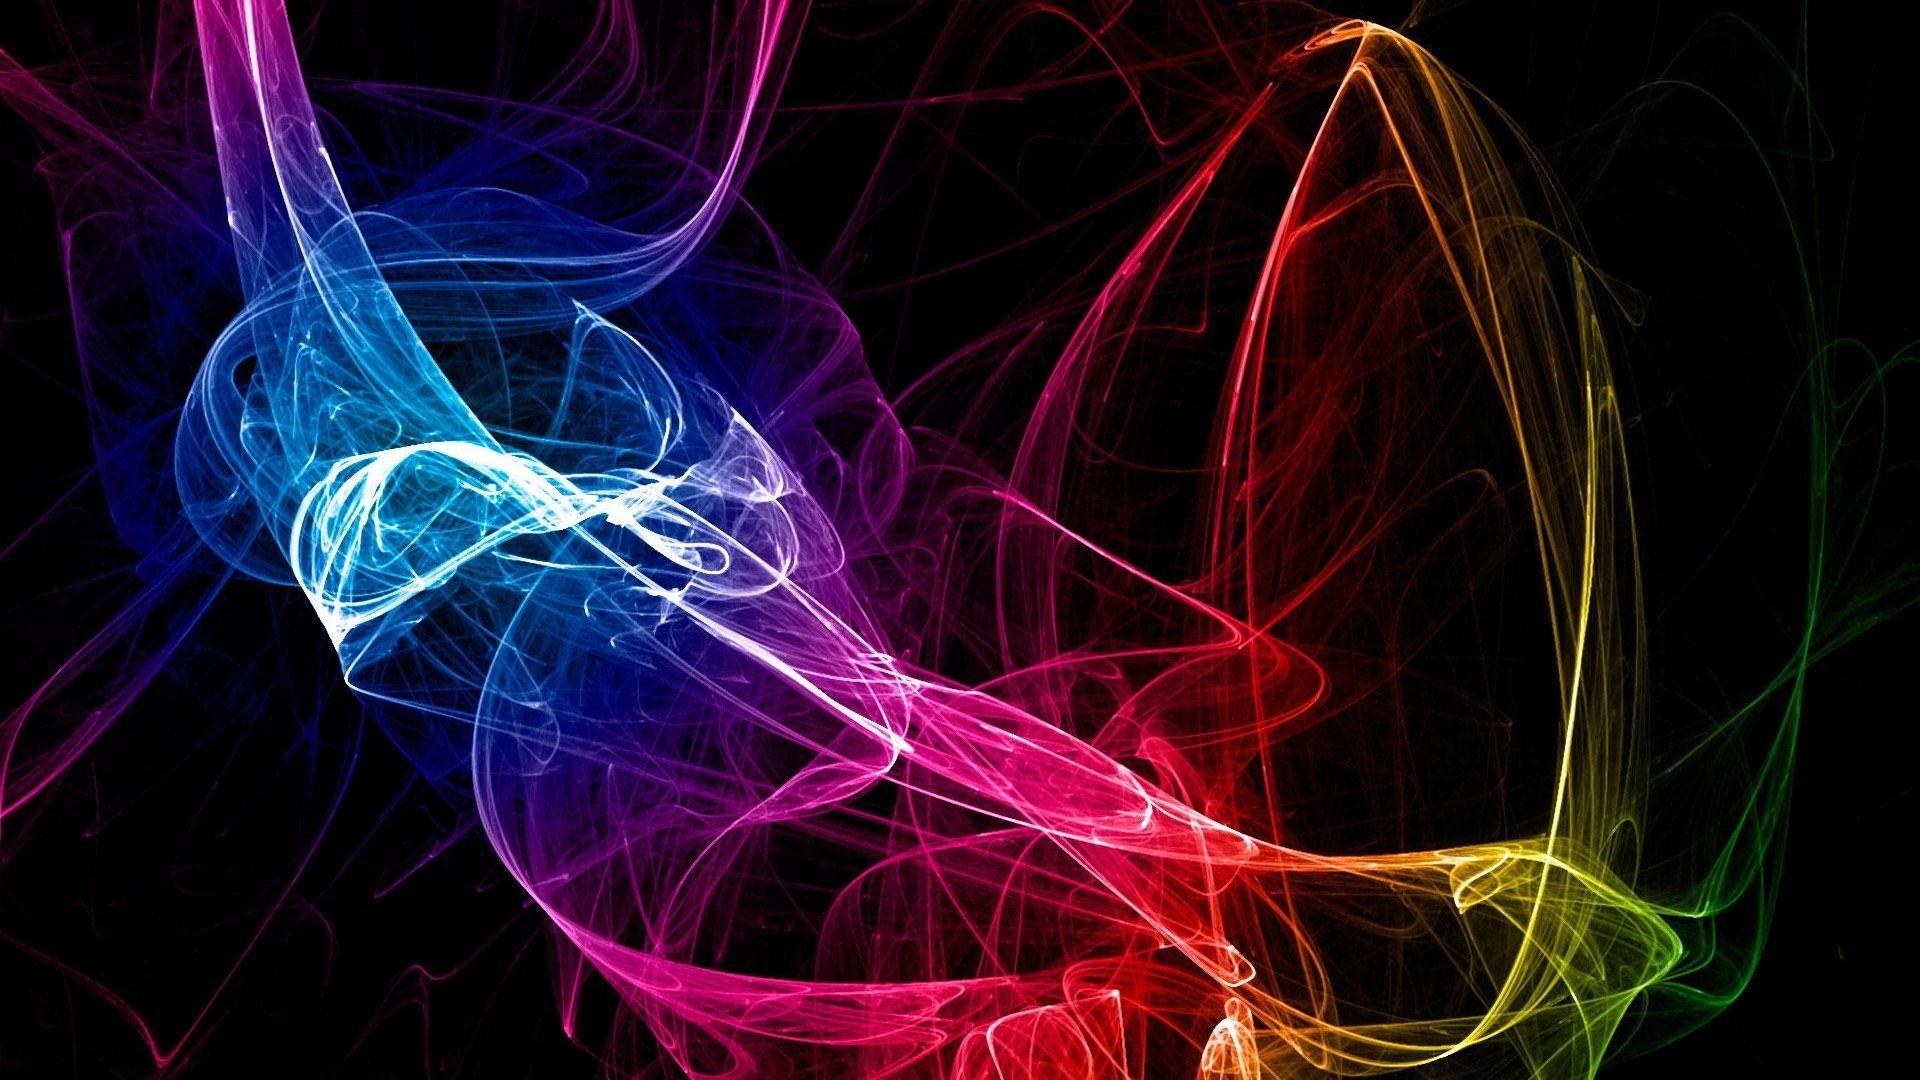 Res 1920x1080 7 Neon Wallpapers7 1 600x338 Neon Wallpaper Neon Wallpaper